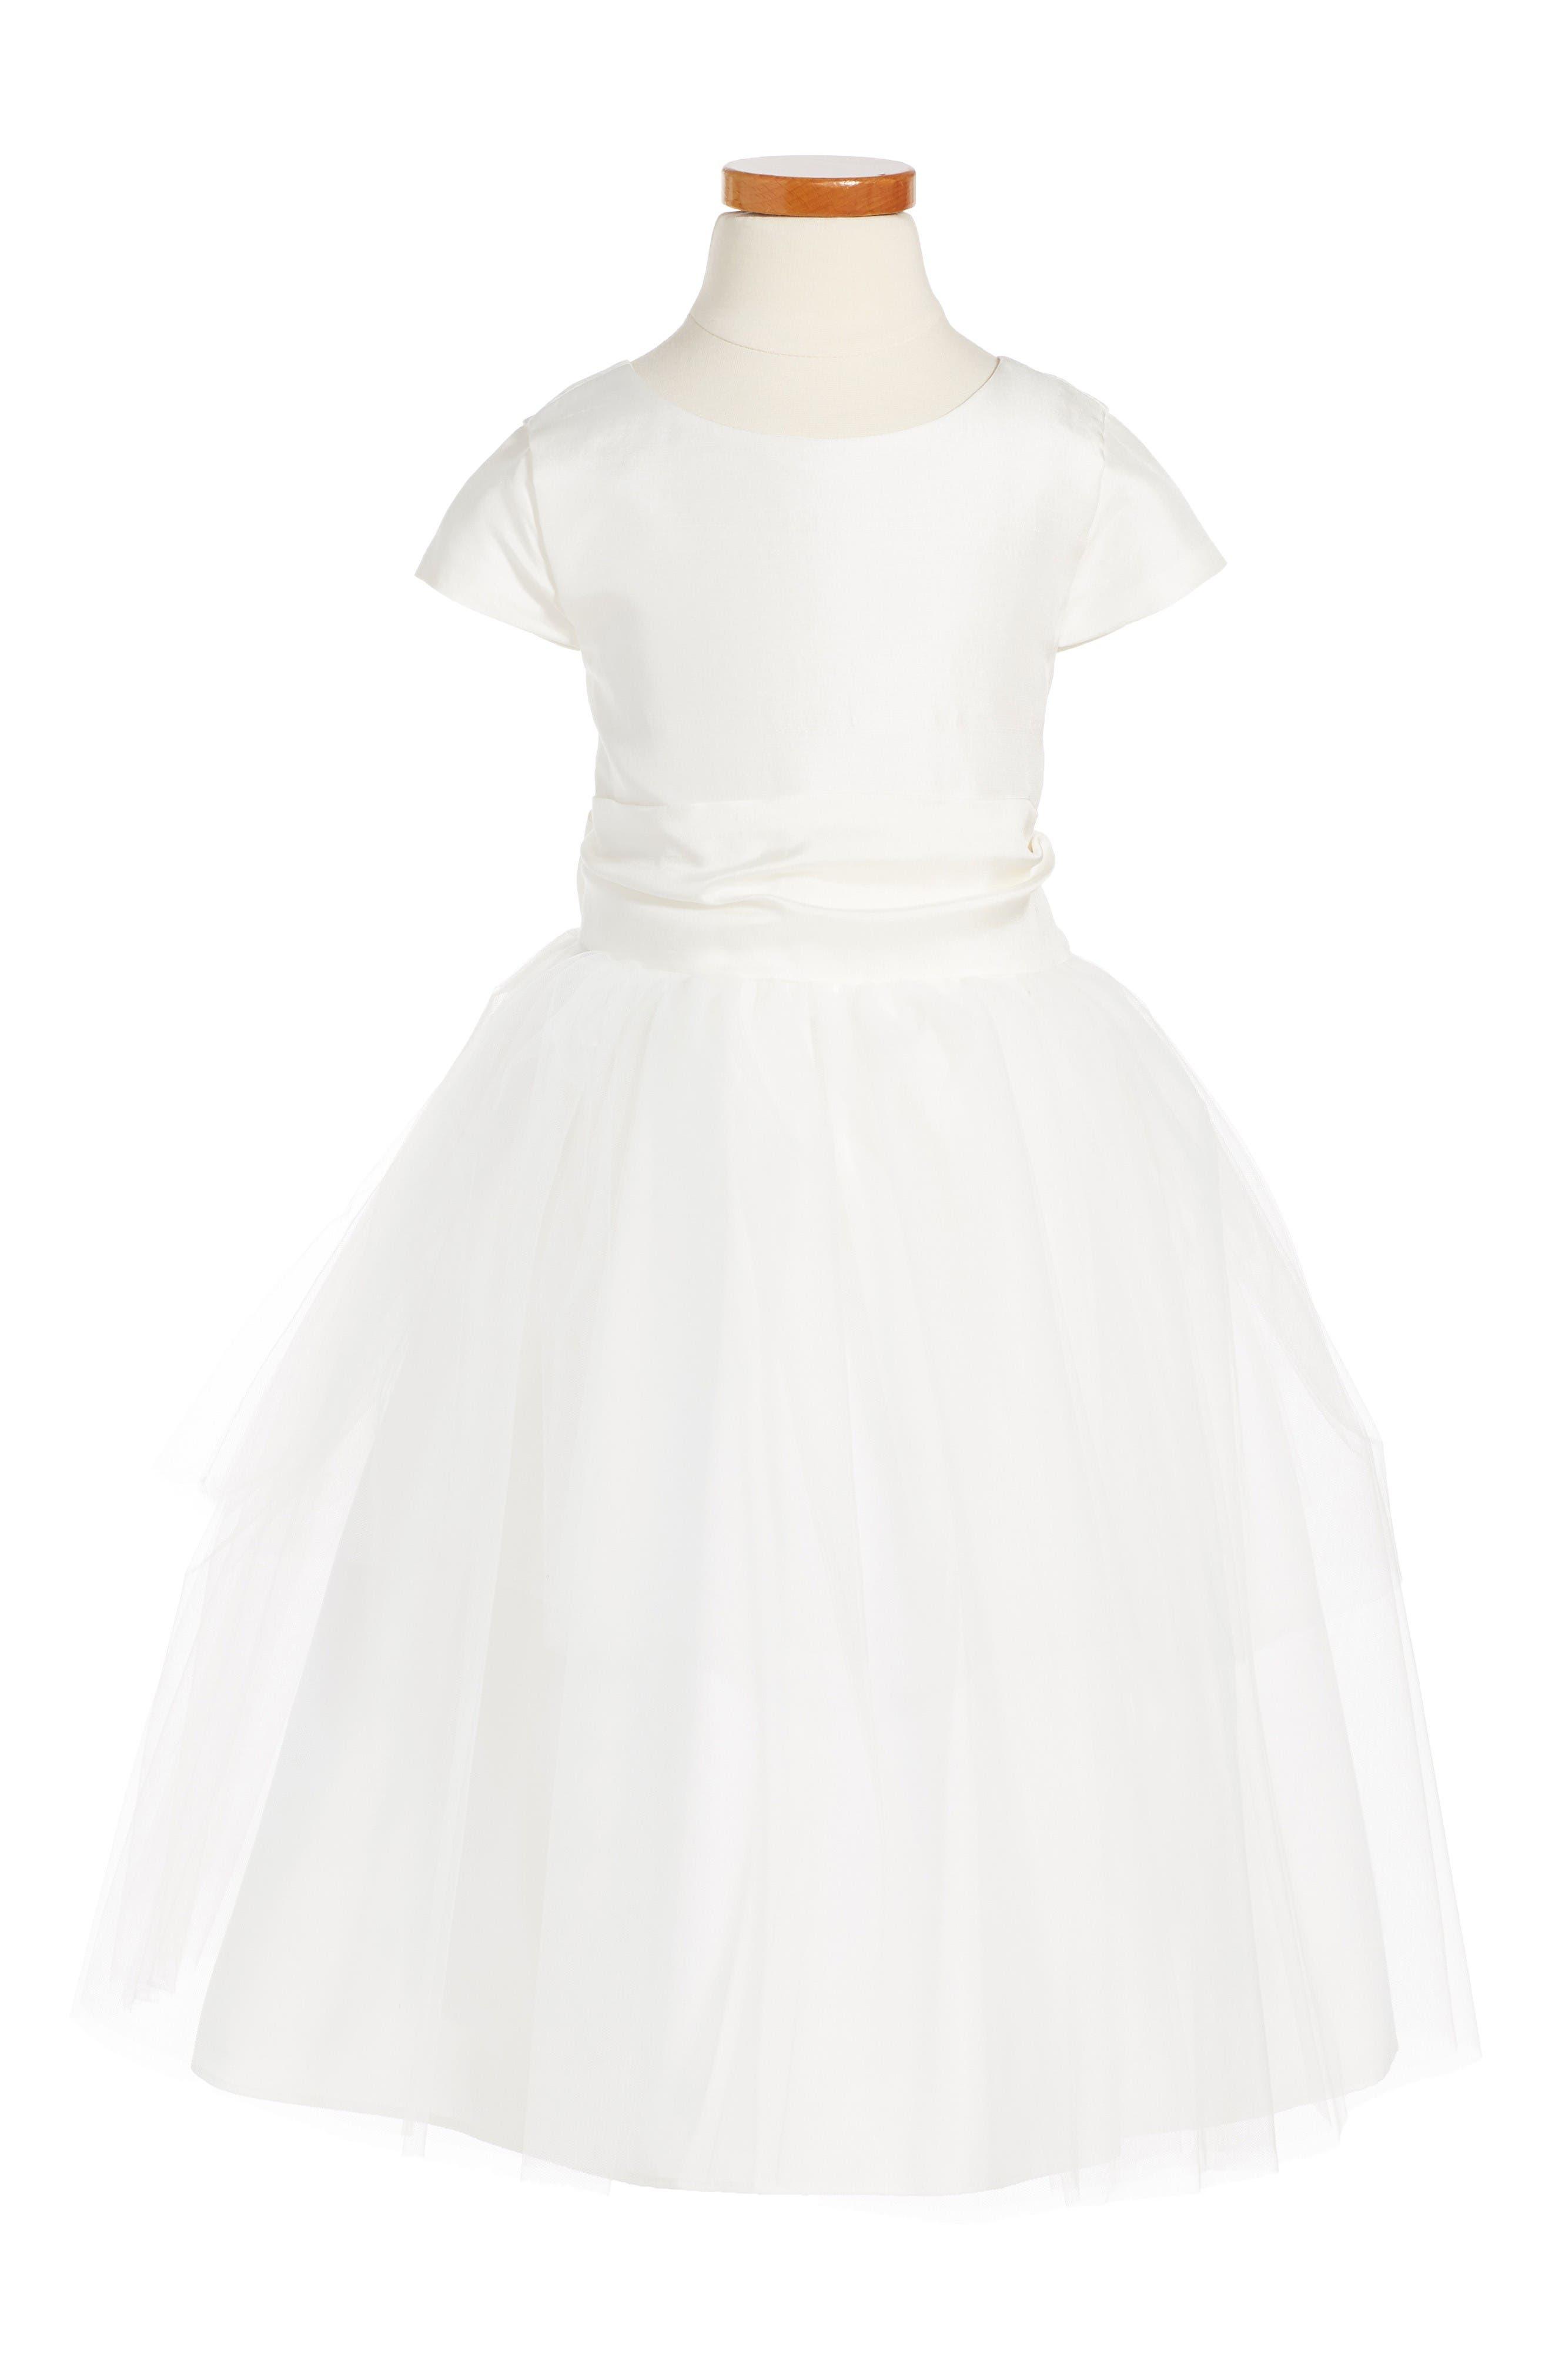 US ANGELS Cap Sleeve Dress